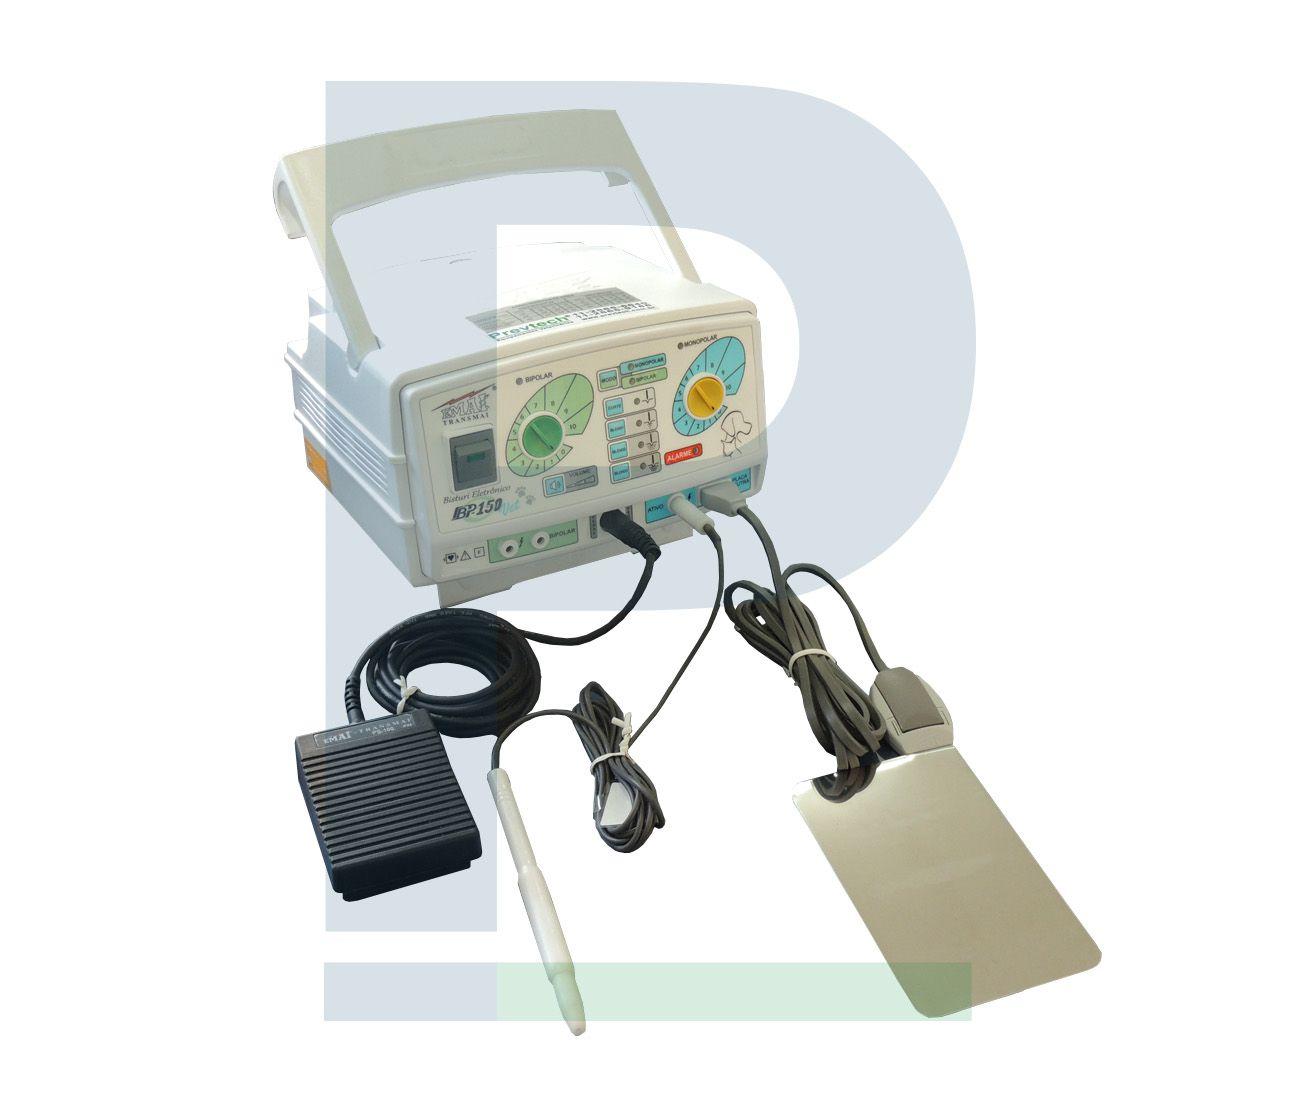 Bisturi Eletrônico Veterinário BP150 S